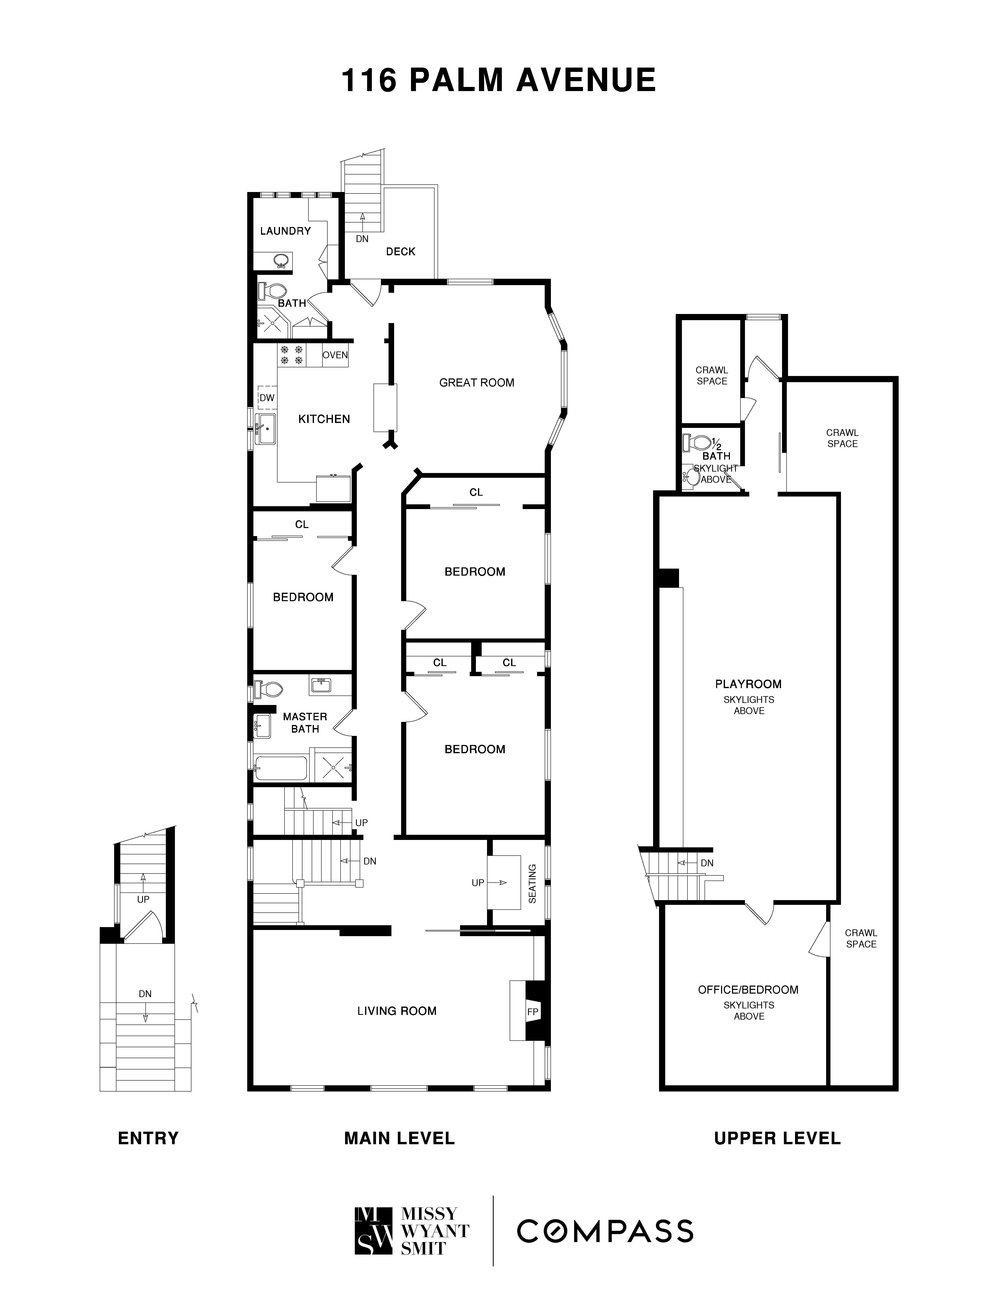 116 Palm Floor Plans.jpg